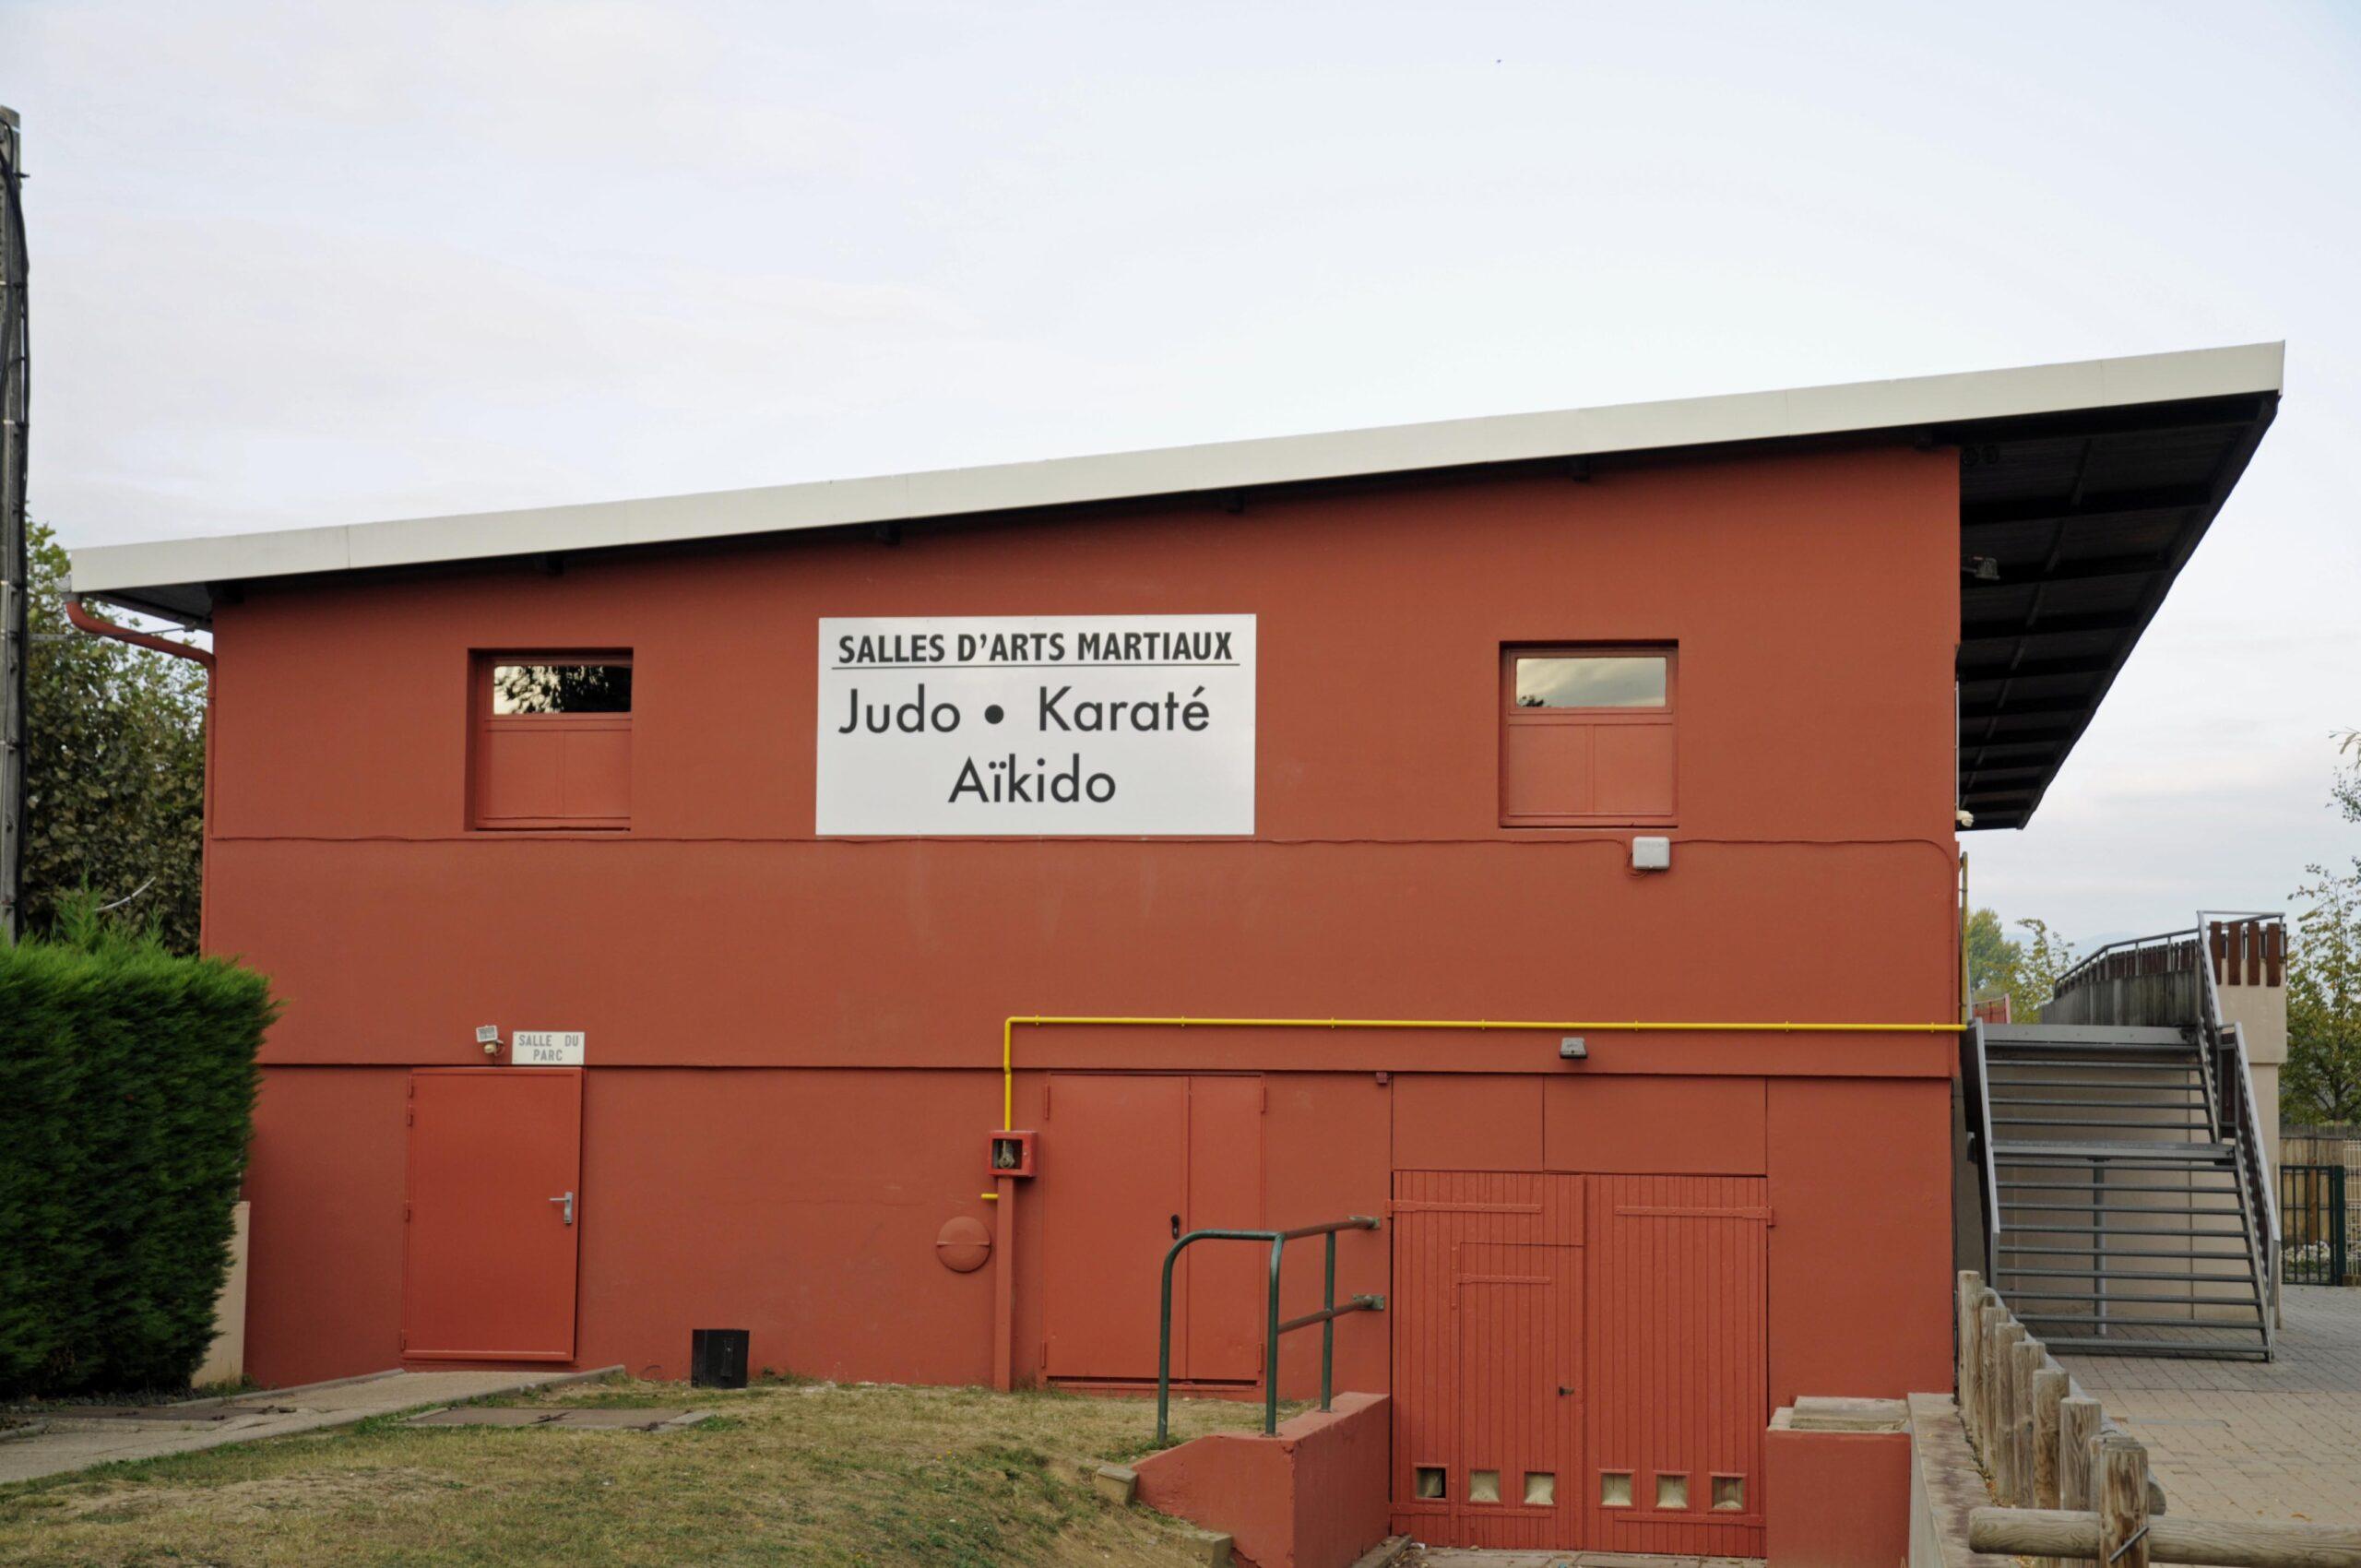 Salle d'art martiaux